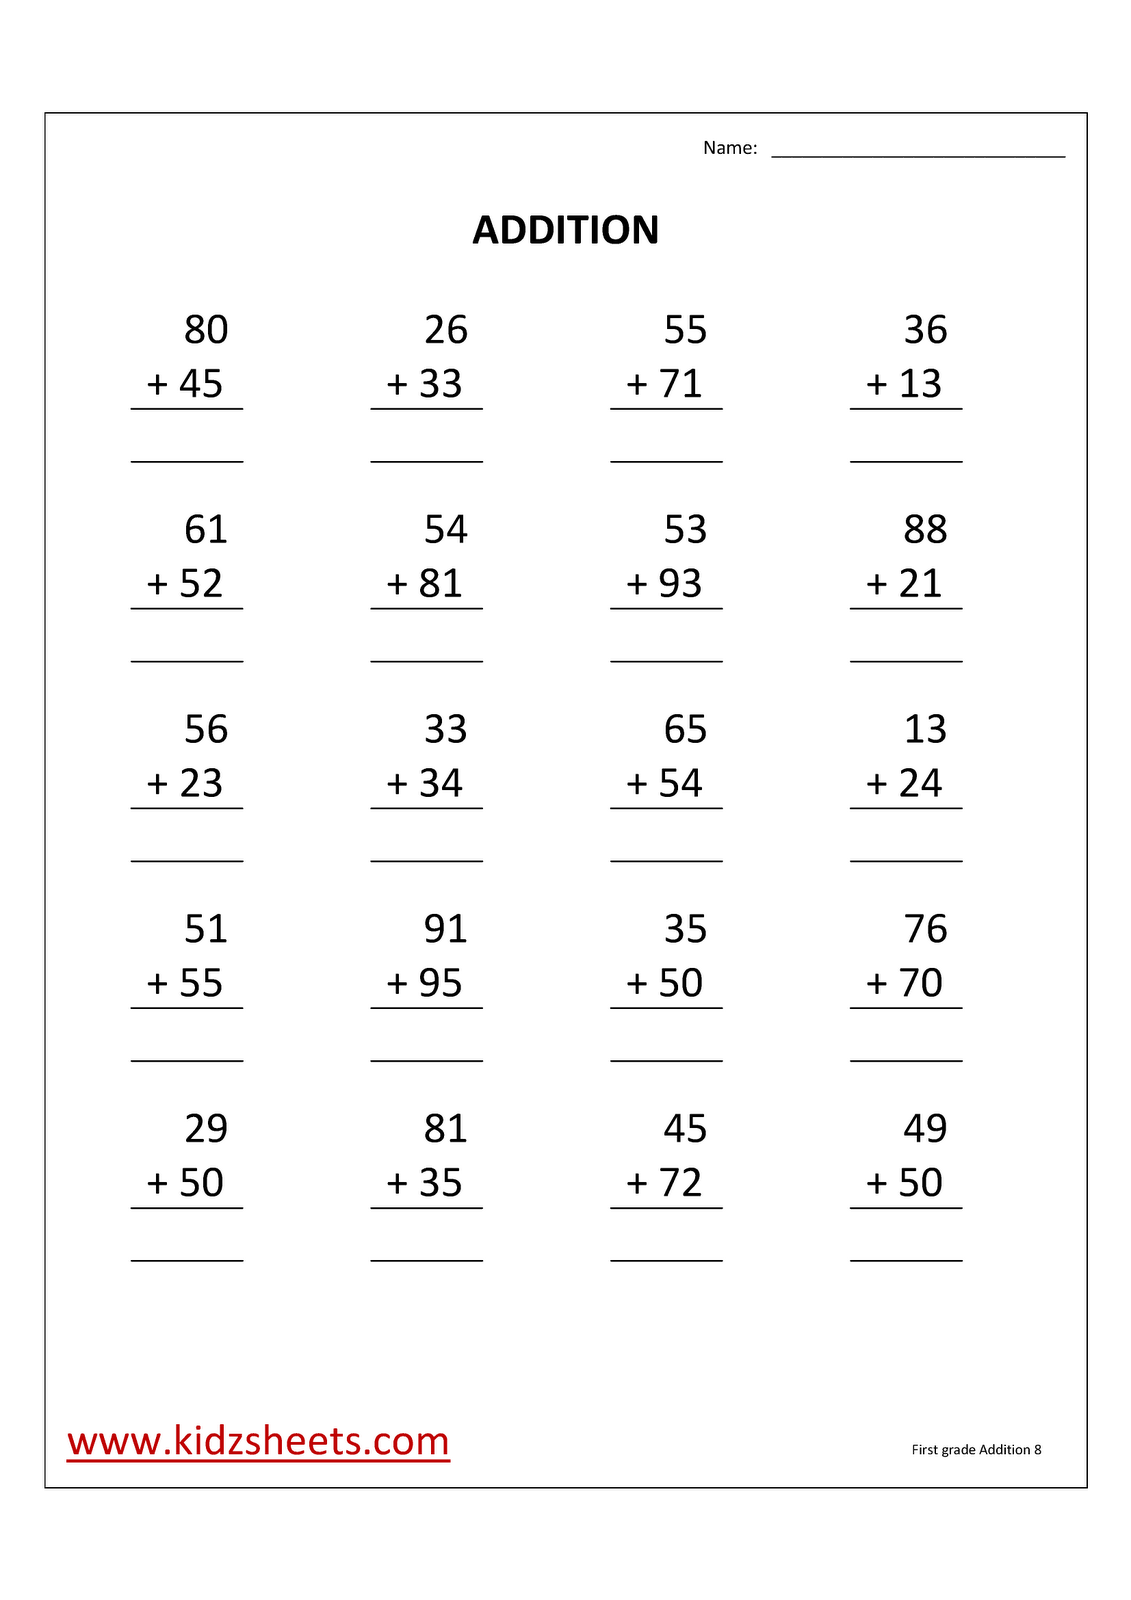 Kidz Worksheets: First Grade Addition Worksheet8 [ 1600 x 1131 Pixel ]